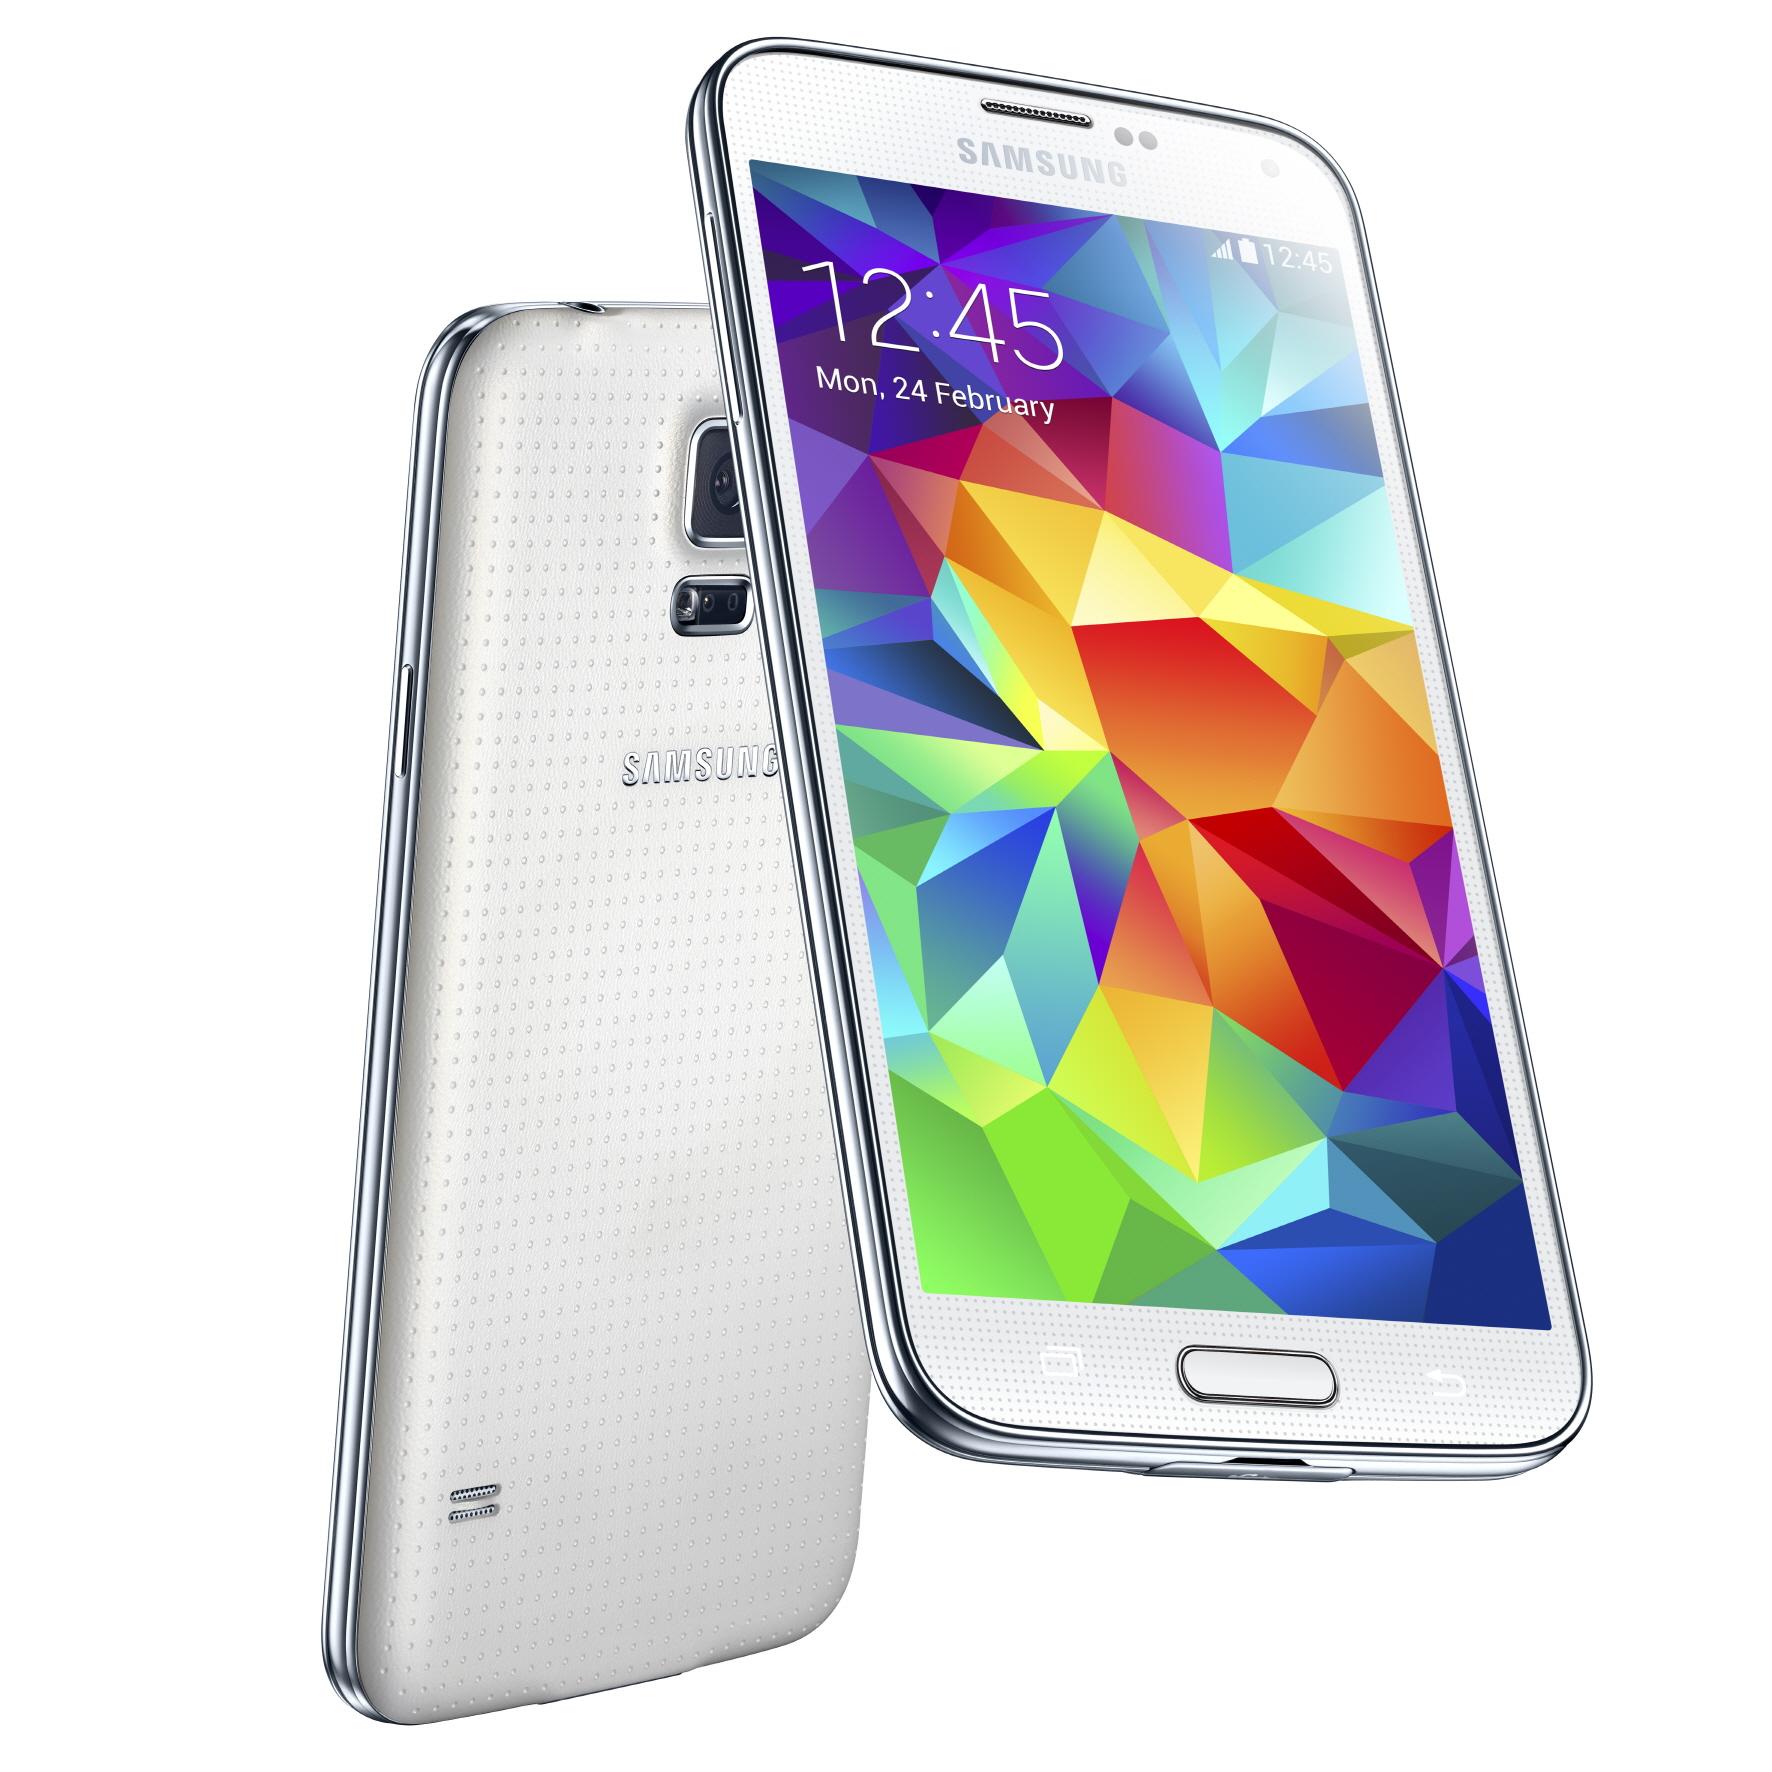 Samsung Announces Galaxy S5